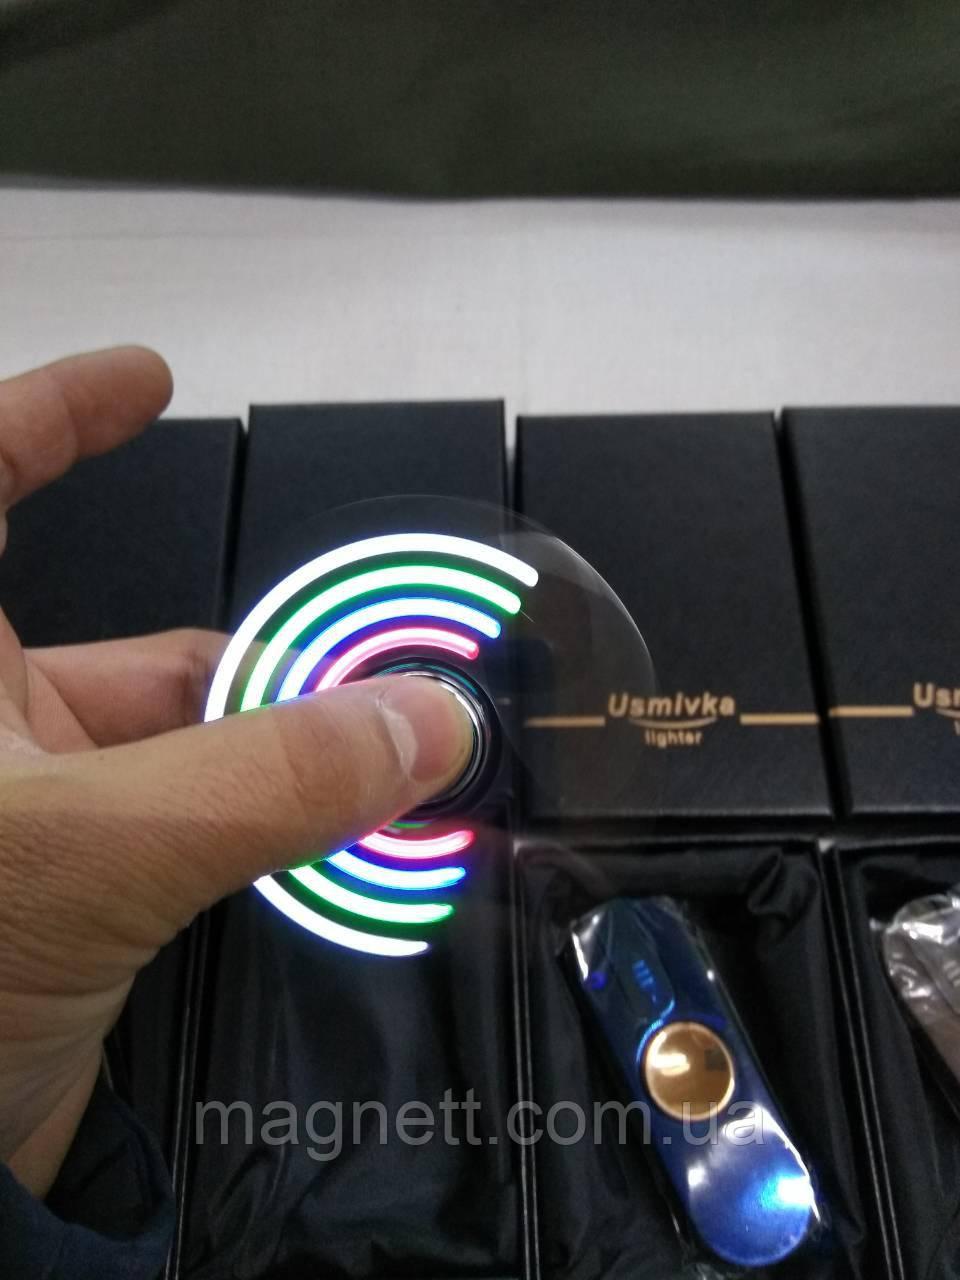 USB зажигалка - спиннер Spinner Usmivka Разные Цвета